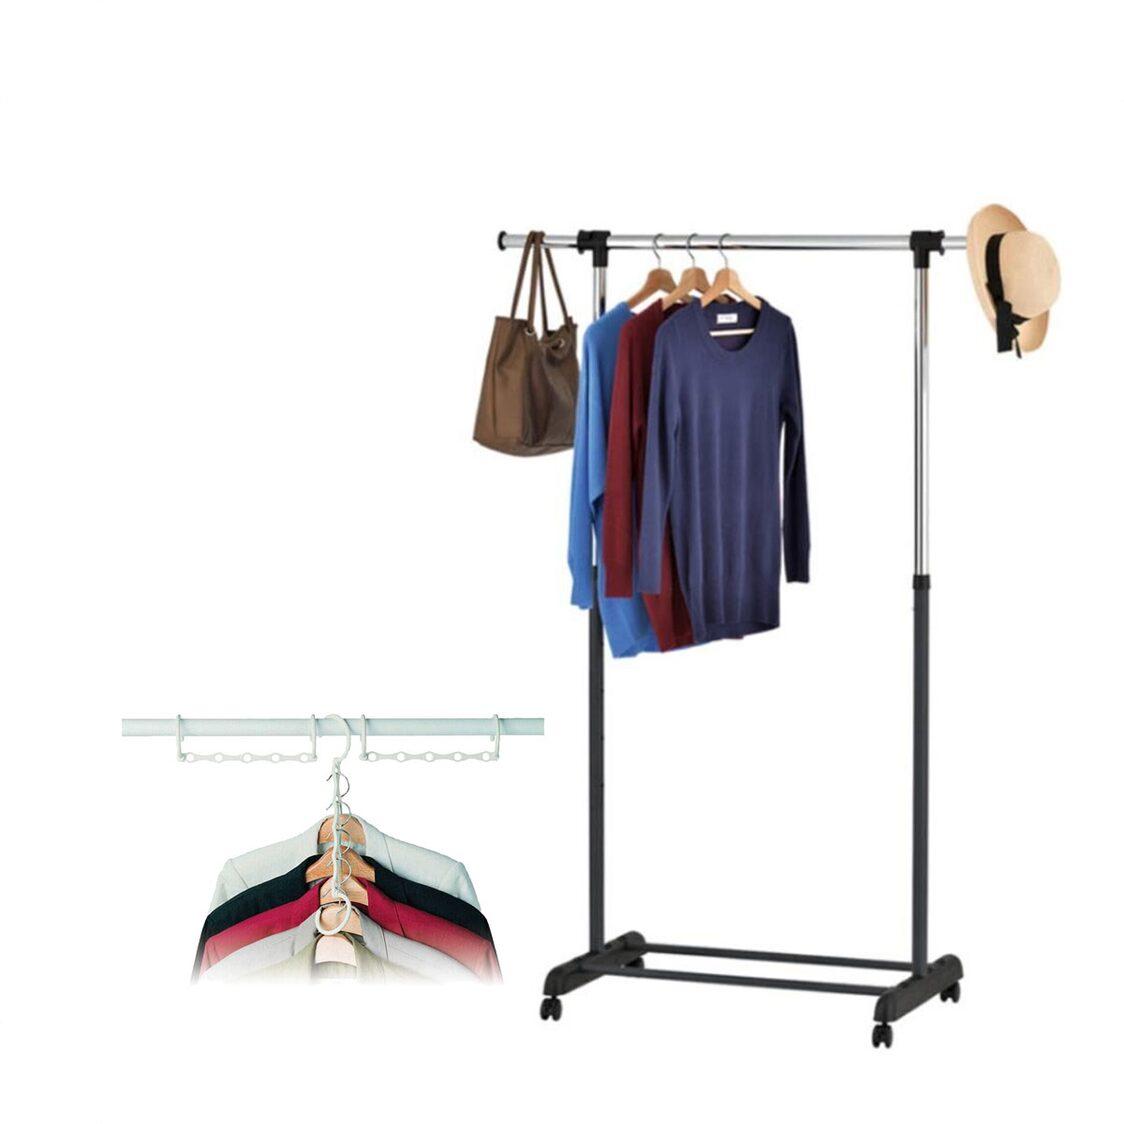 Rene Uno Single Garment Rack Matt L70450